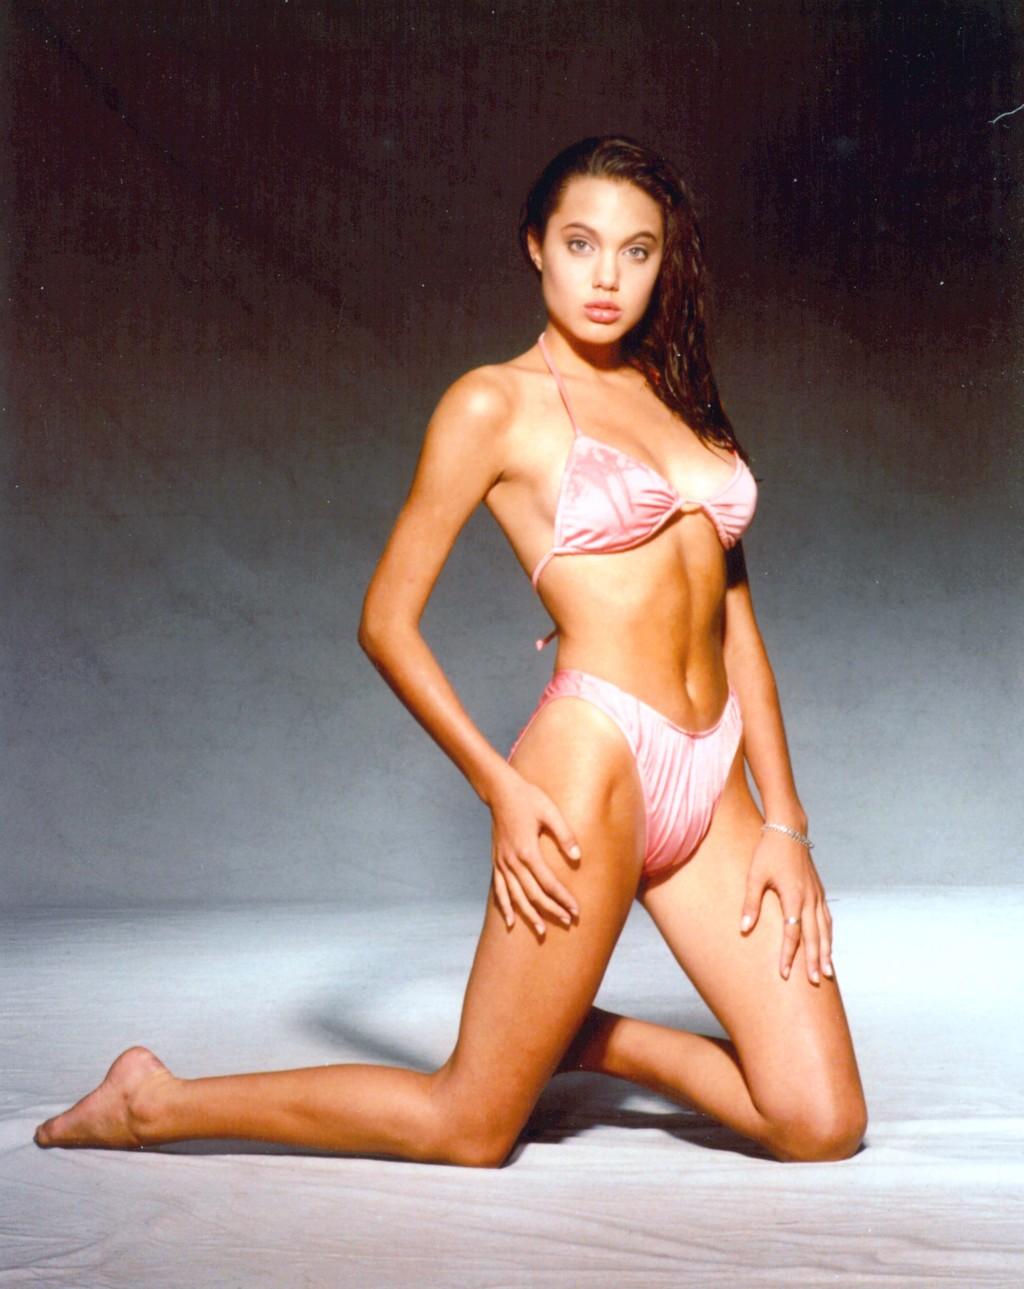 Die heiesten Beach Bodys: Stars im Bikini - Bilder - Jolie